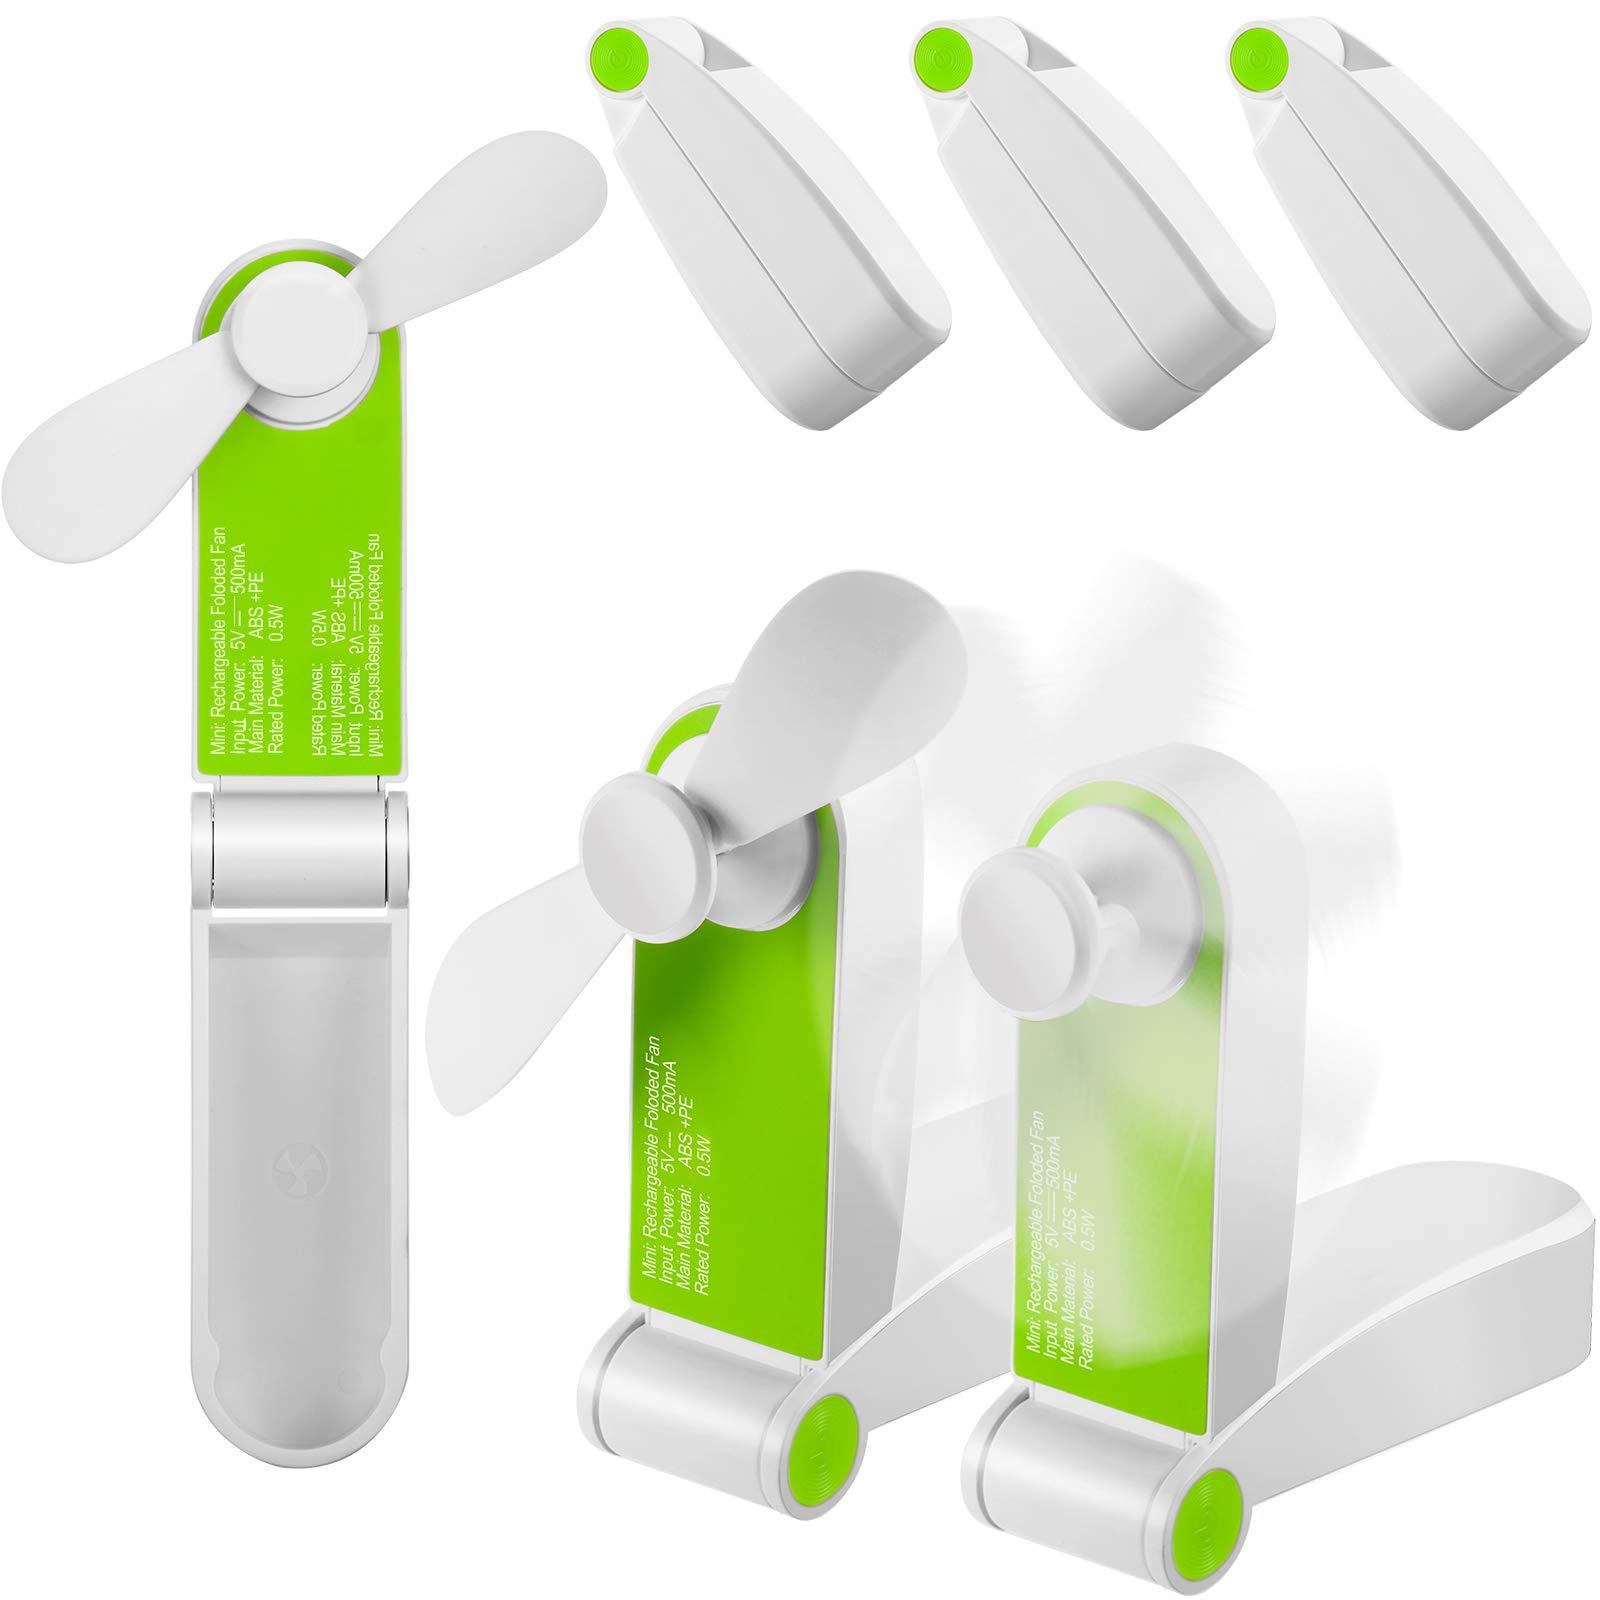 Details about  /Foldable Mini Handheld Fan Personal USB Rechargeable Summer Portable Fans T7S1